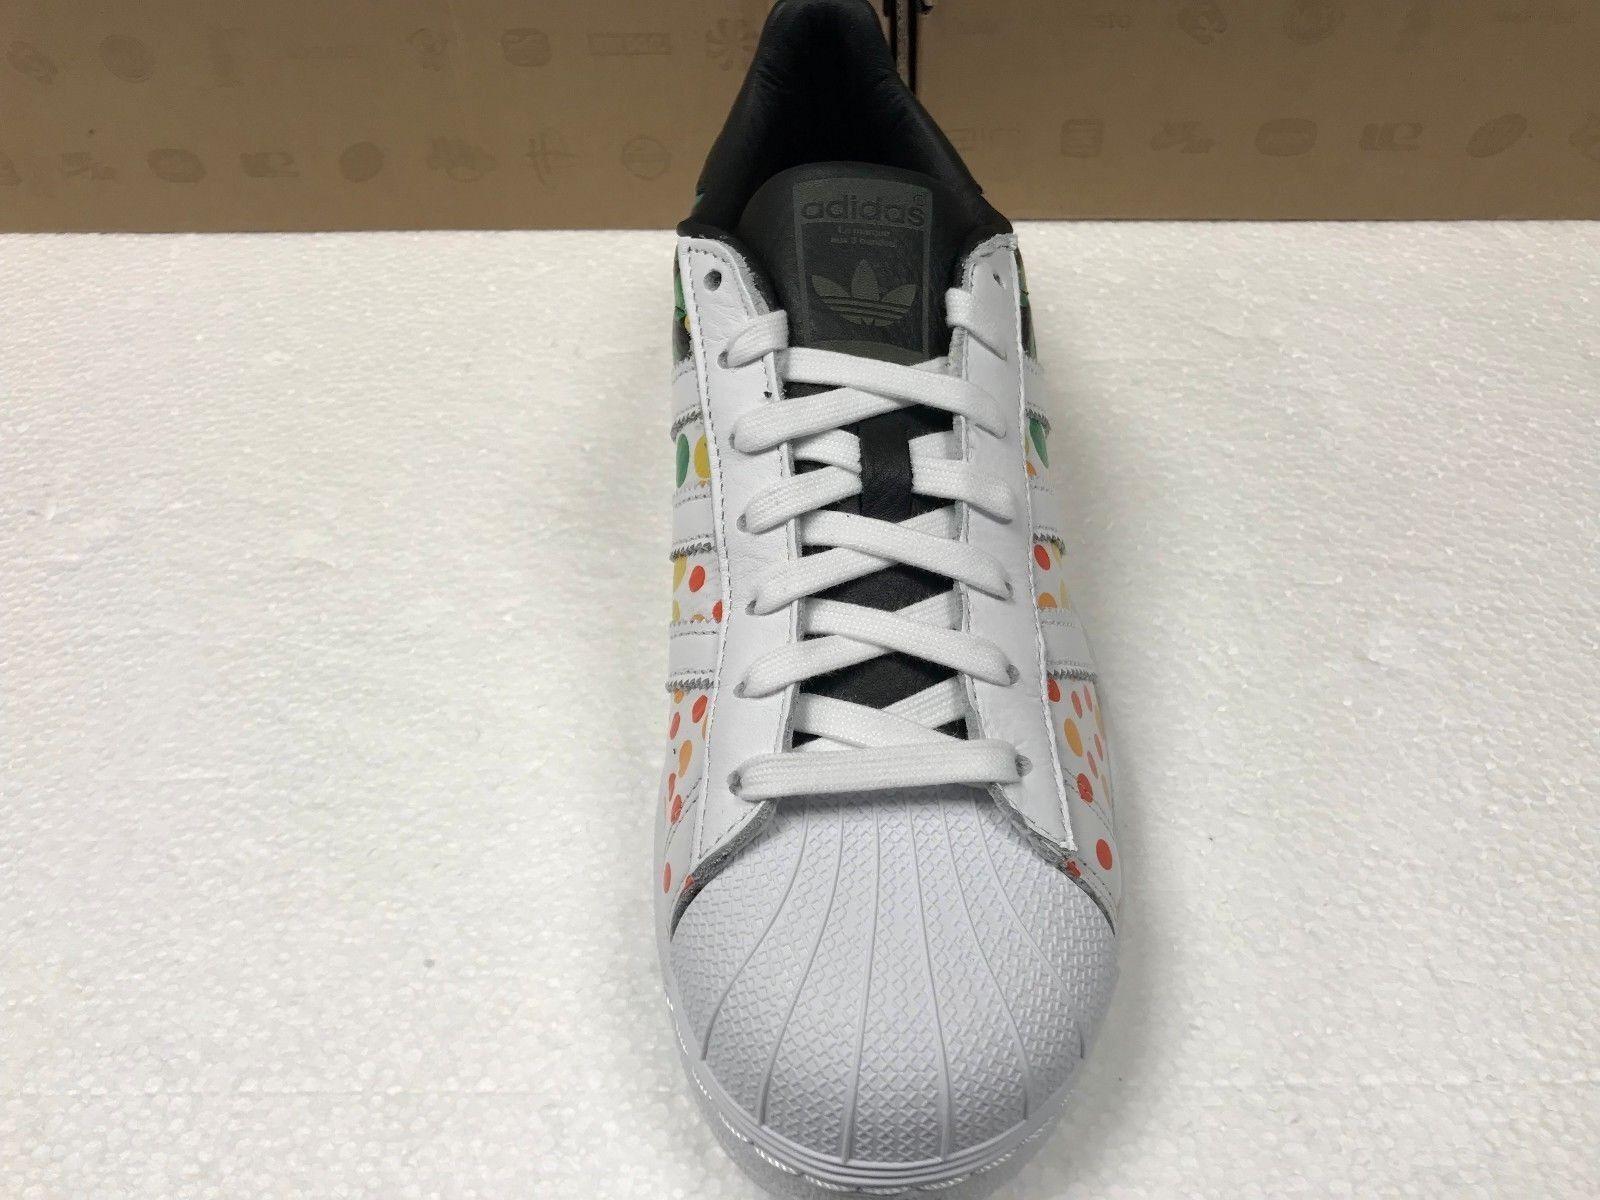 Neue männer adidas superstar stolz pack turnschuhe turnschuhe turnschuhe cm7802-schuhe-multiple größen 2b5695